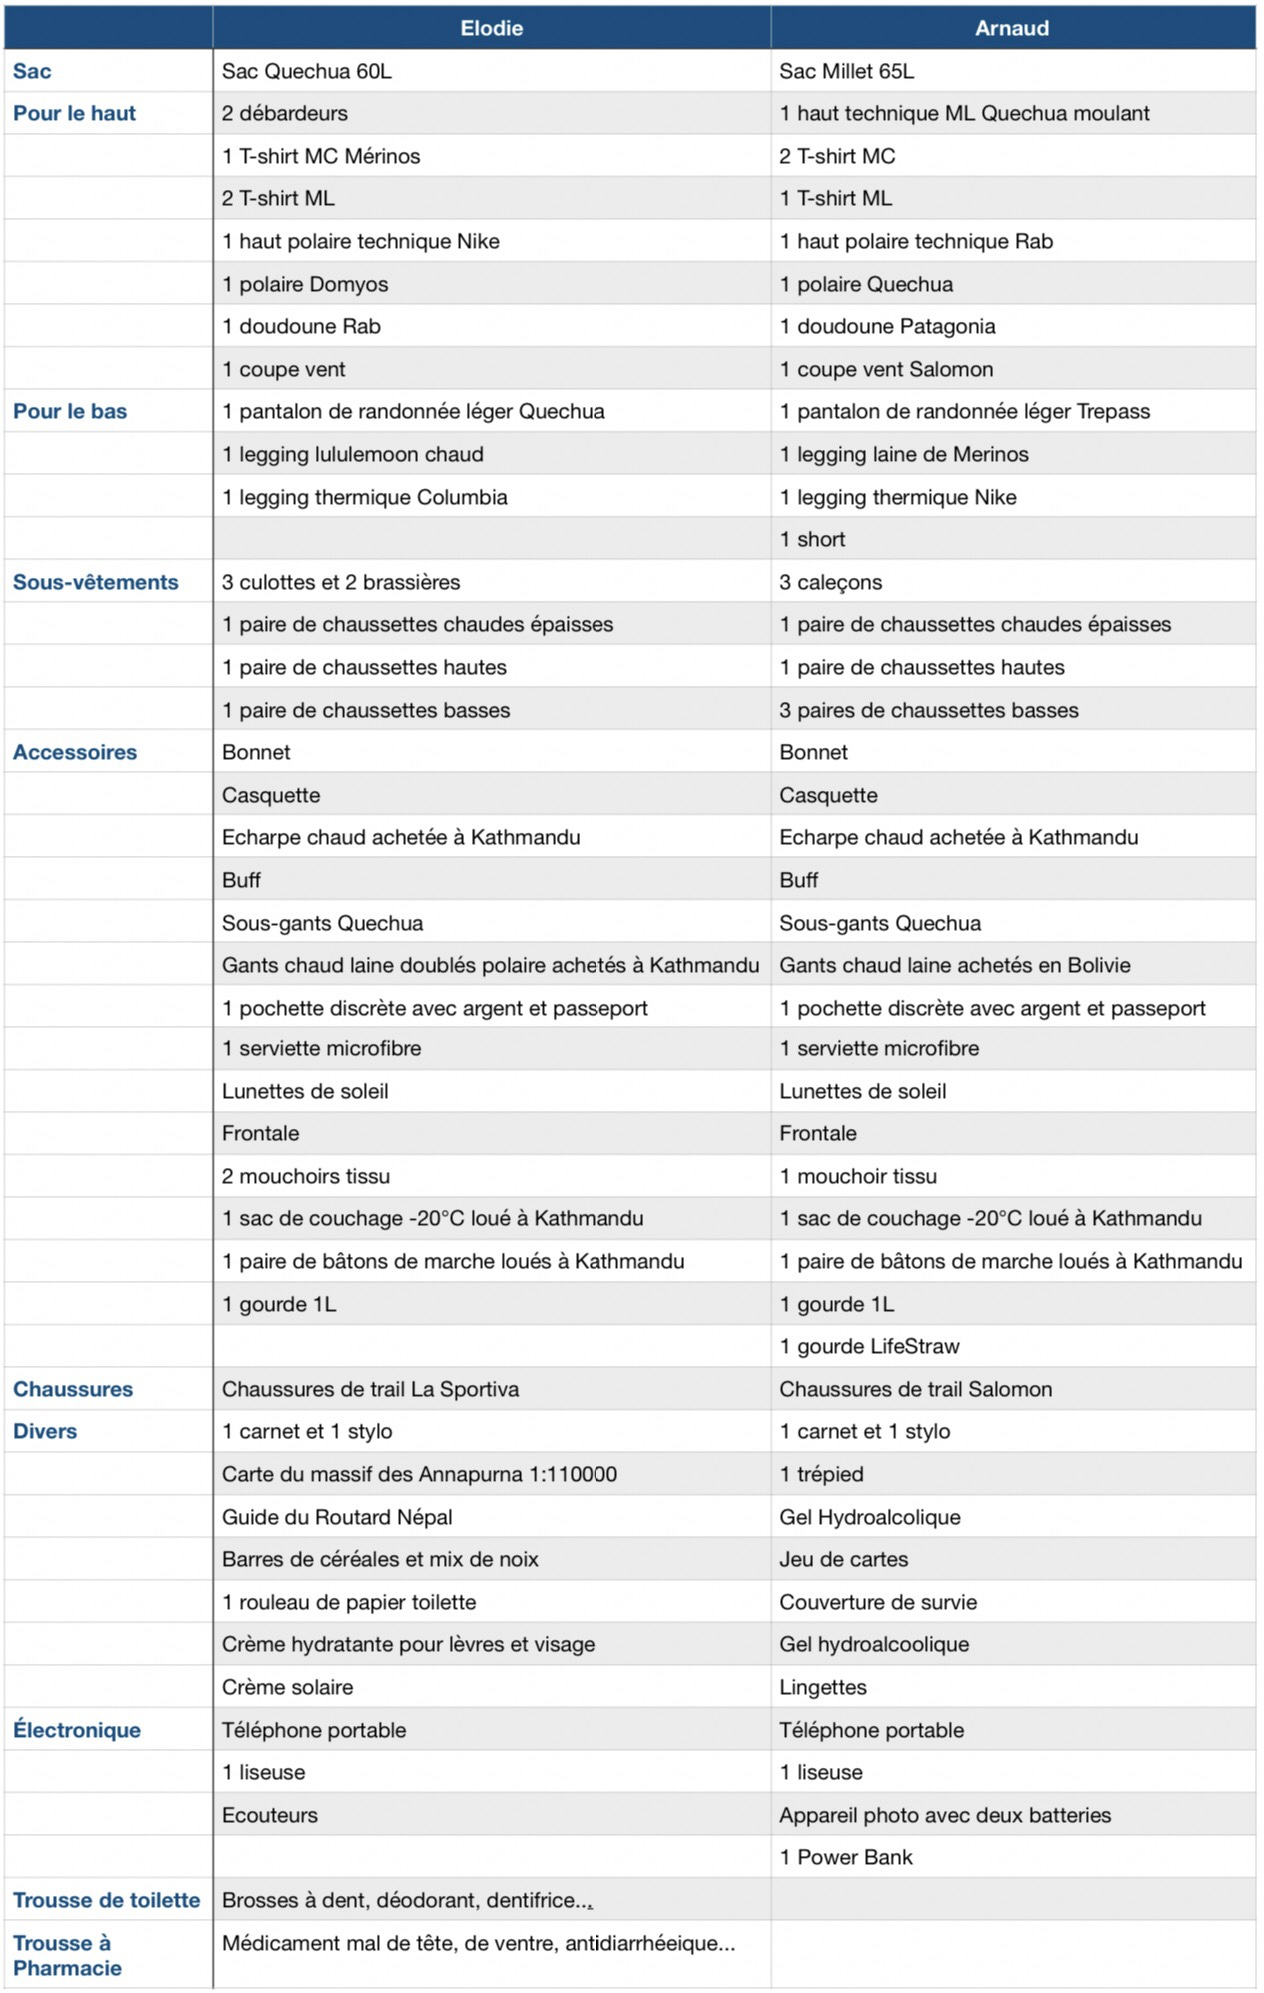 equipement trek nepal liste tableau